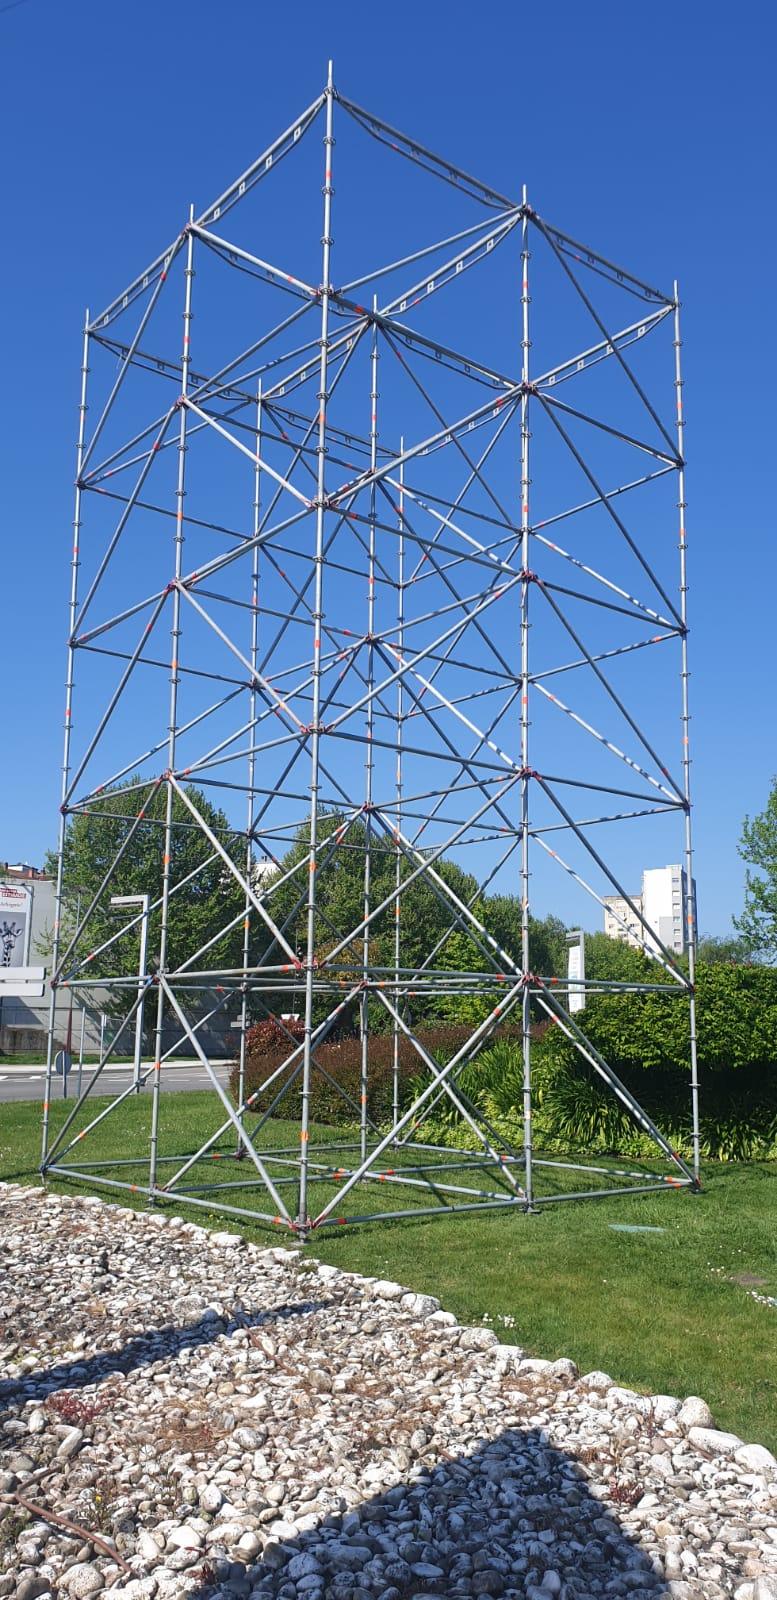 torres-triatlon-pontevedra_1-2019